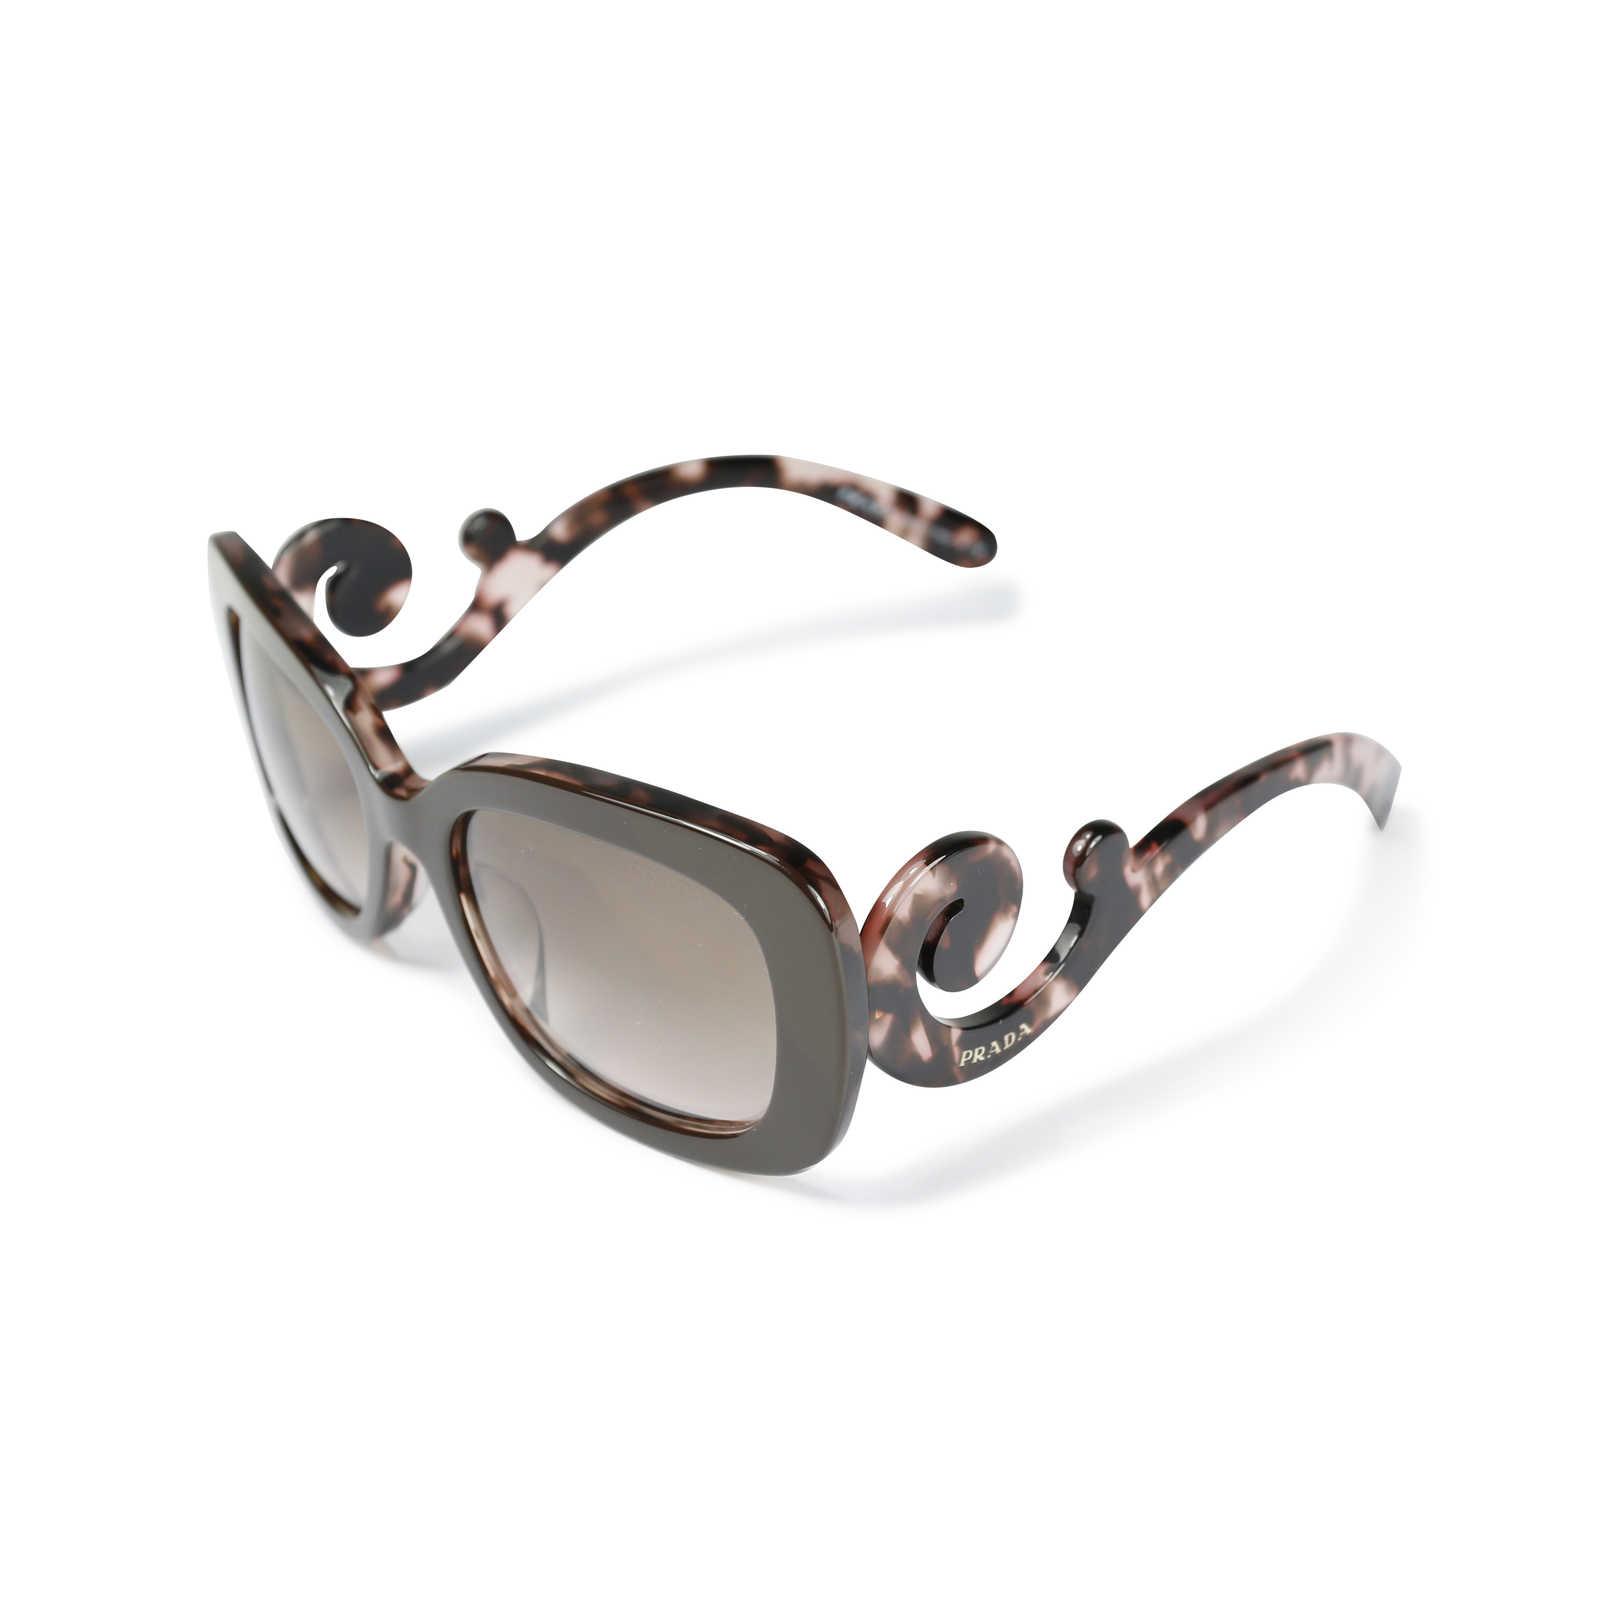 a225c9426df9 ... australia authentic pre owned prada baroque sunglasses pss 156 00028  thumbnail 1 2b5ad f3cb6